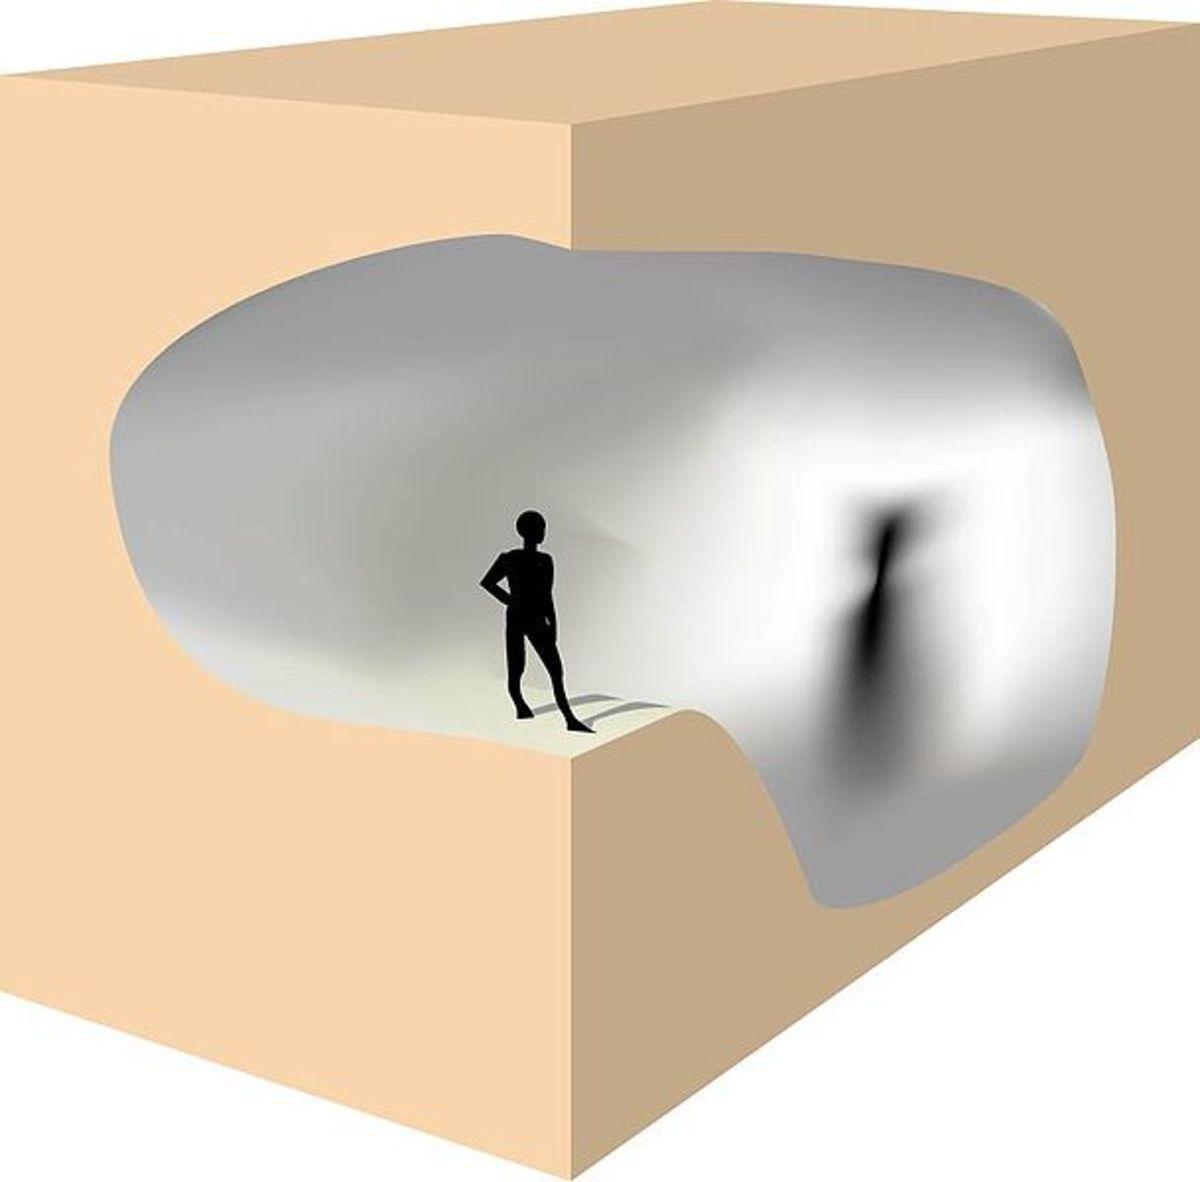 """Plato's Cave"", the False Image"